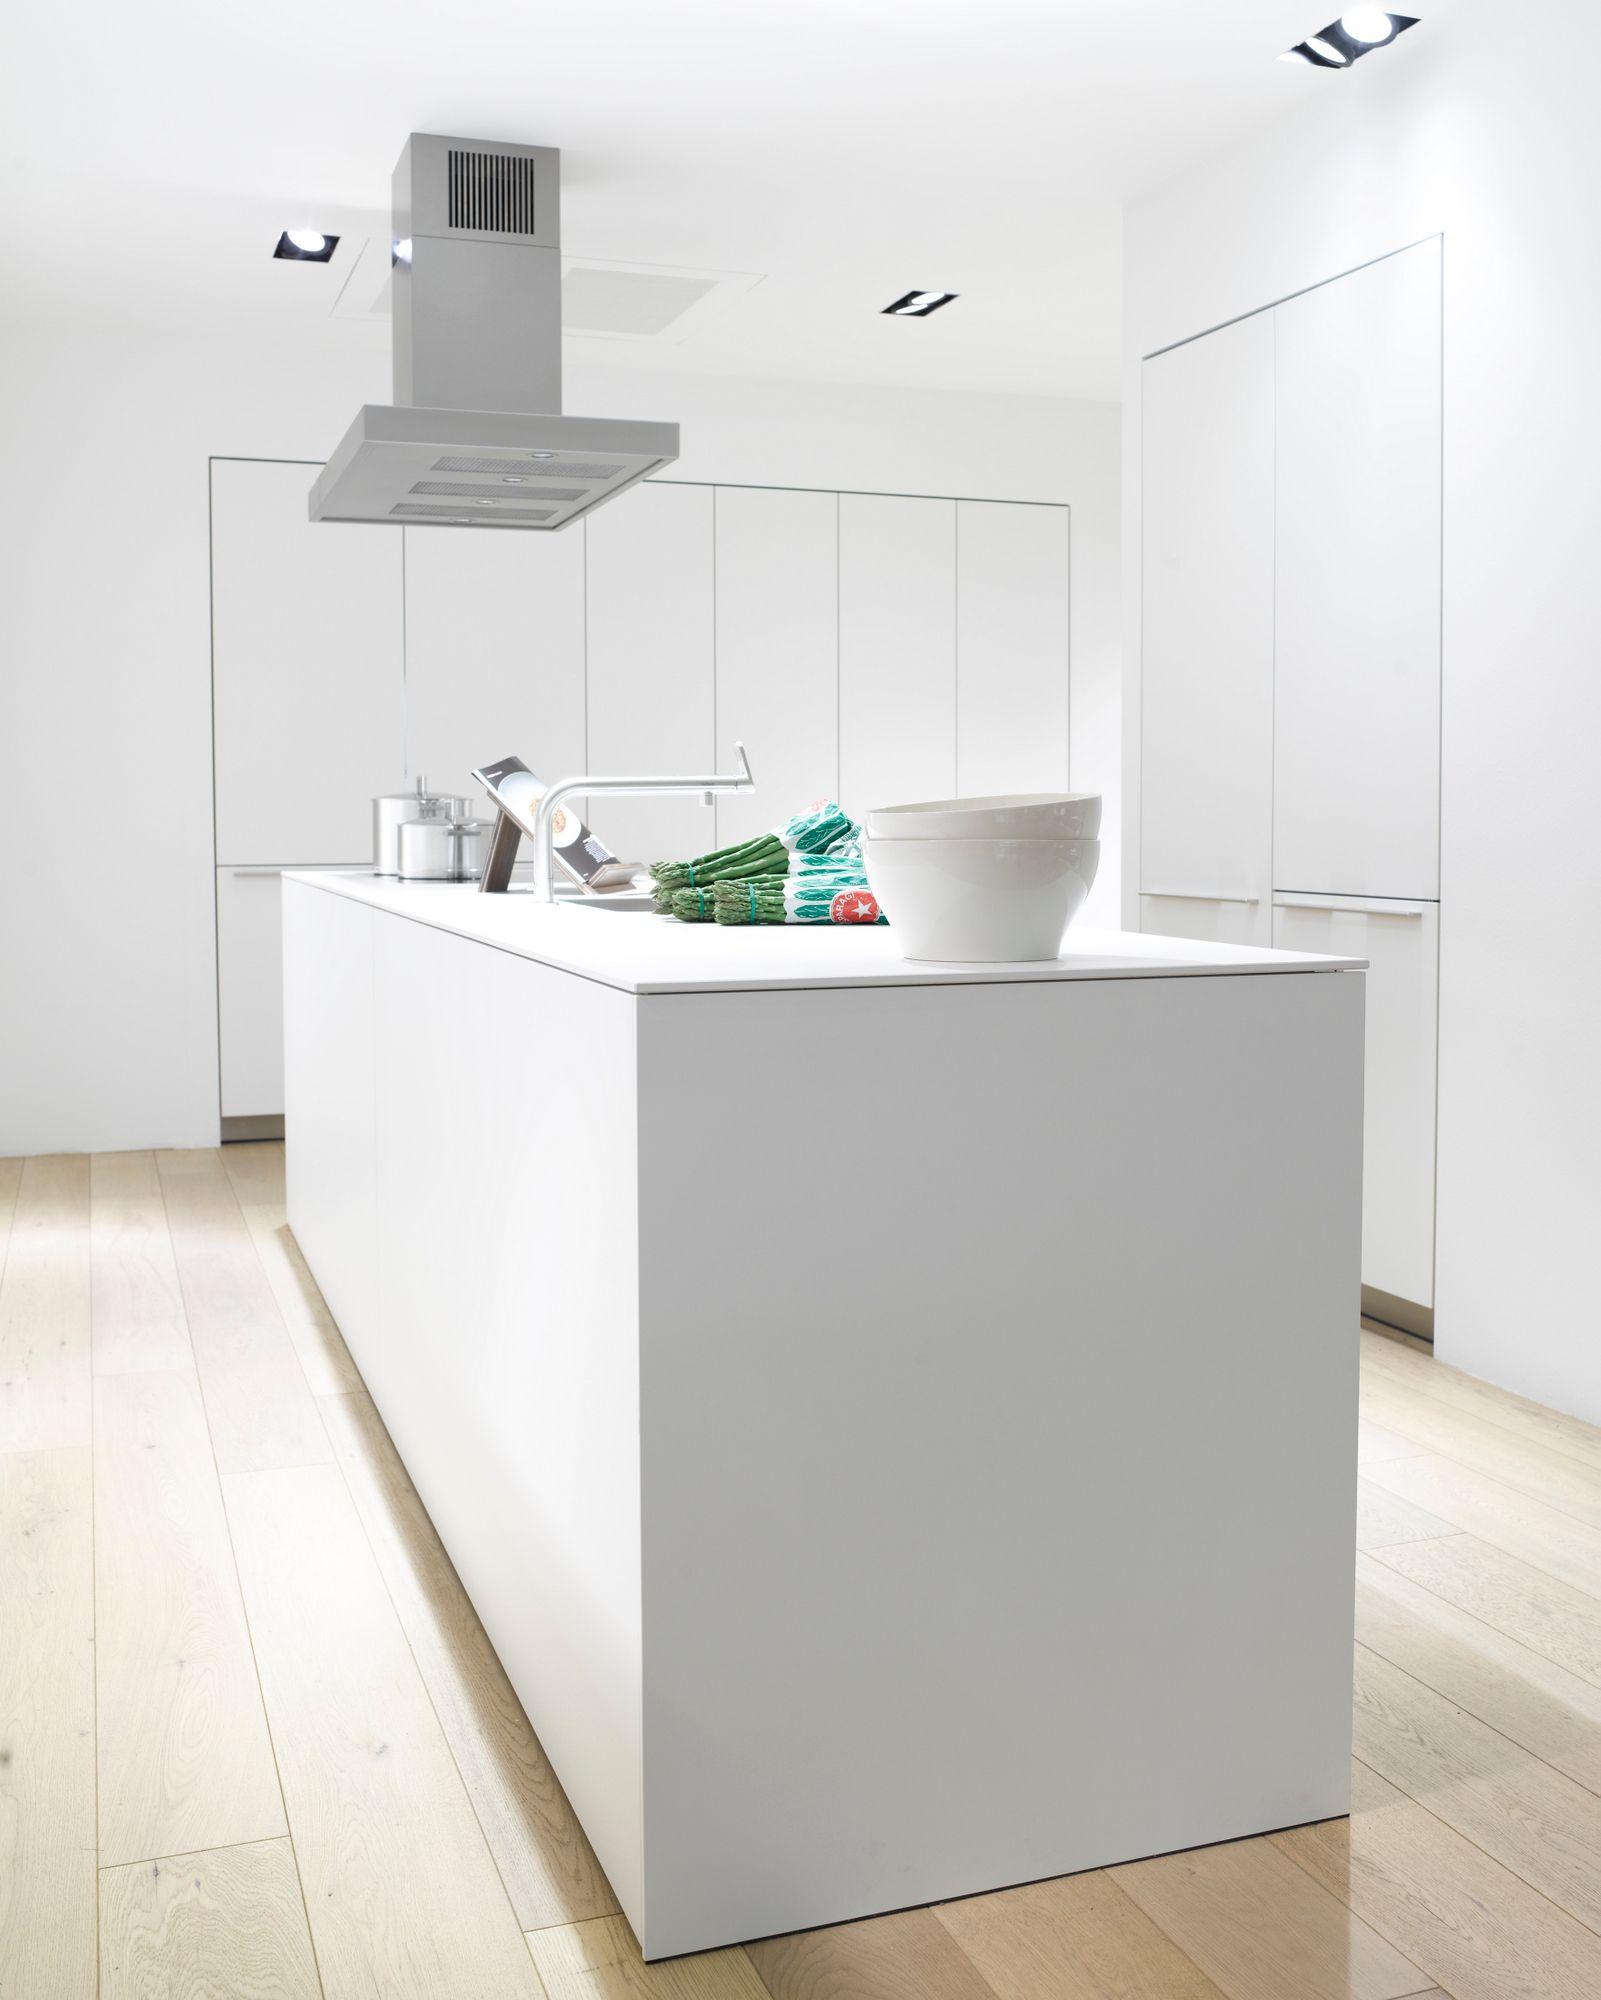 B3 | Cucina in laminato By Bulthaup